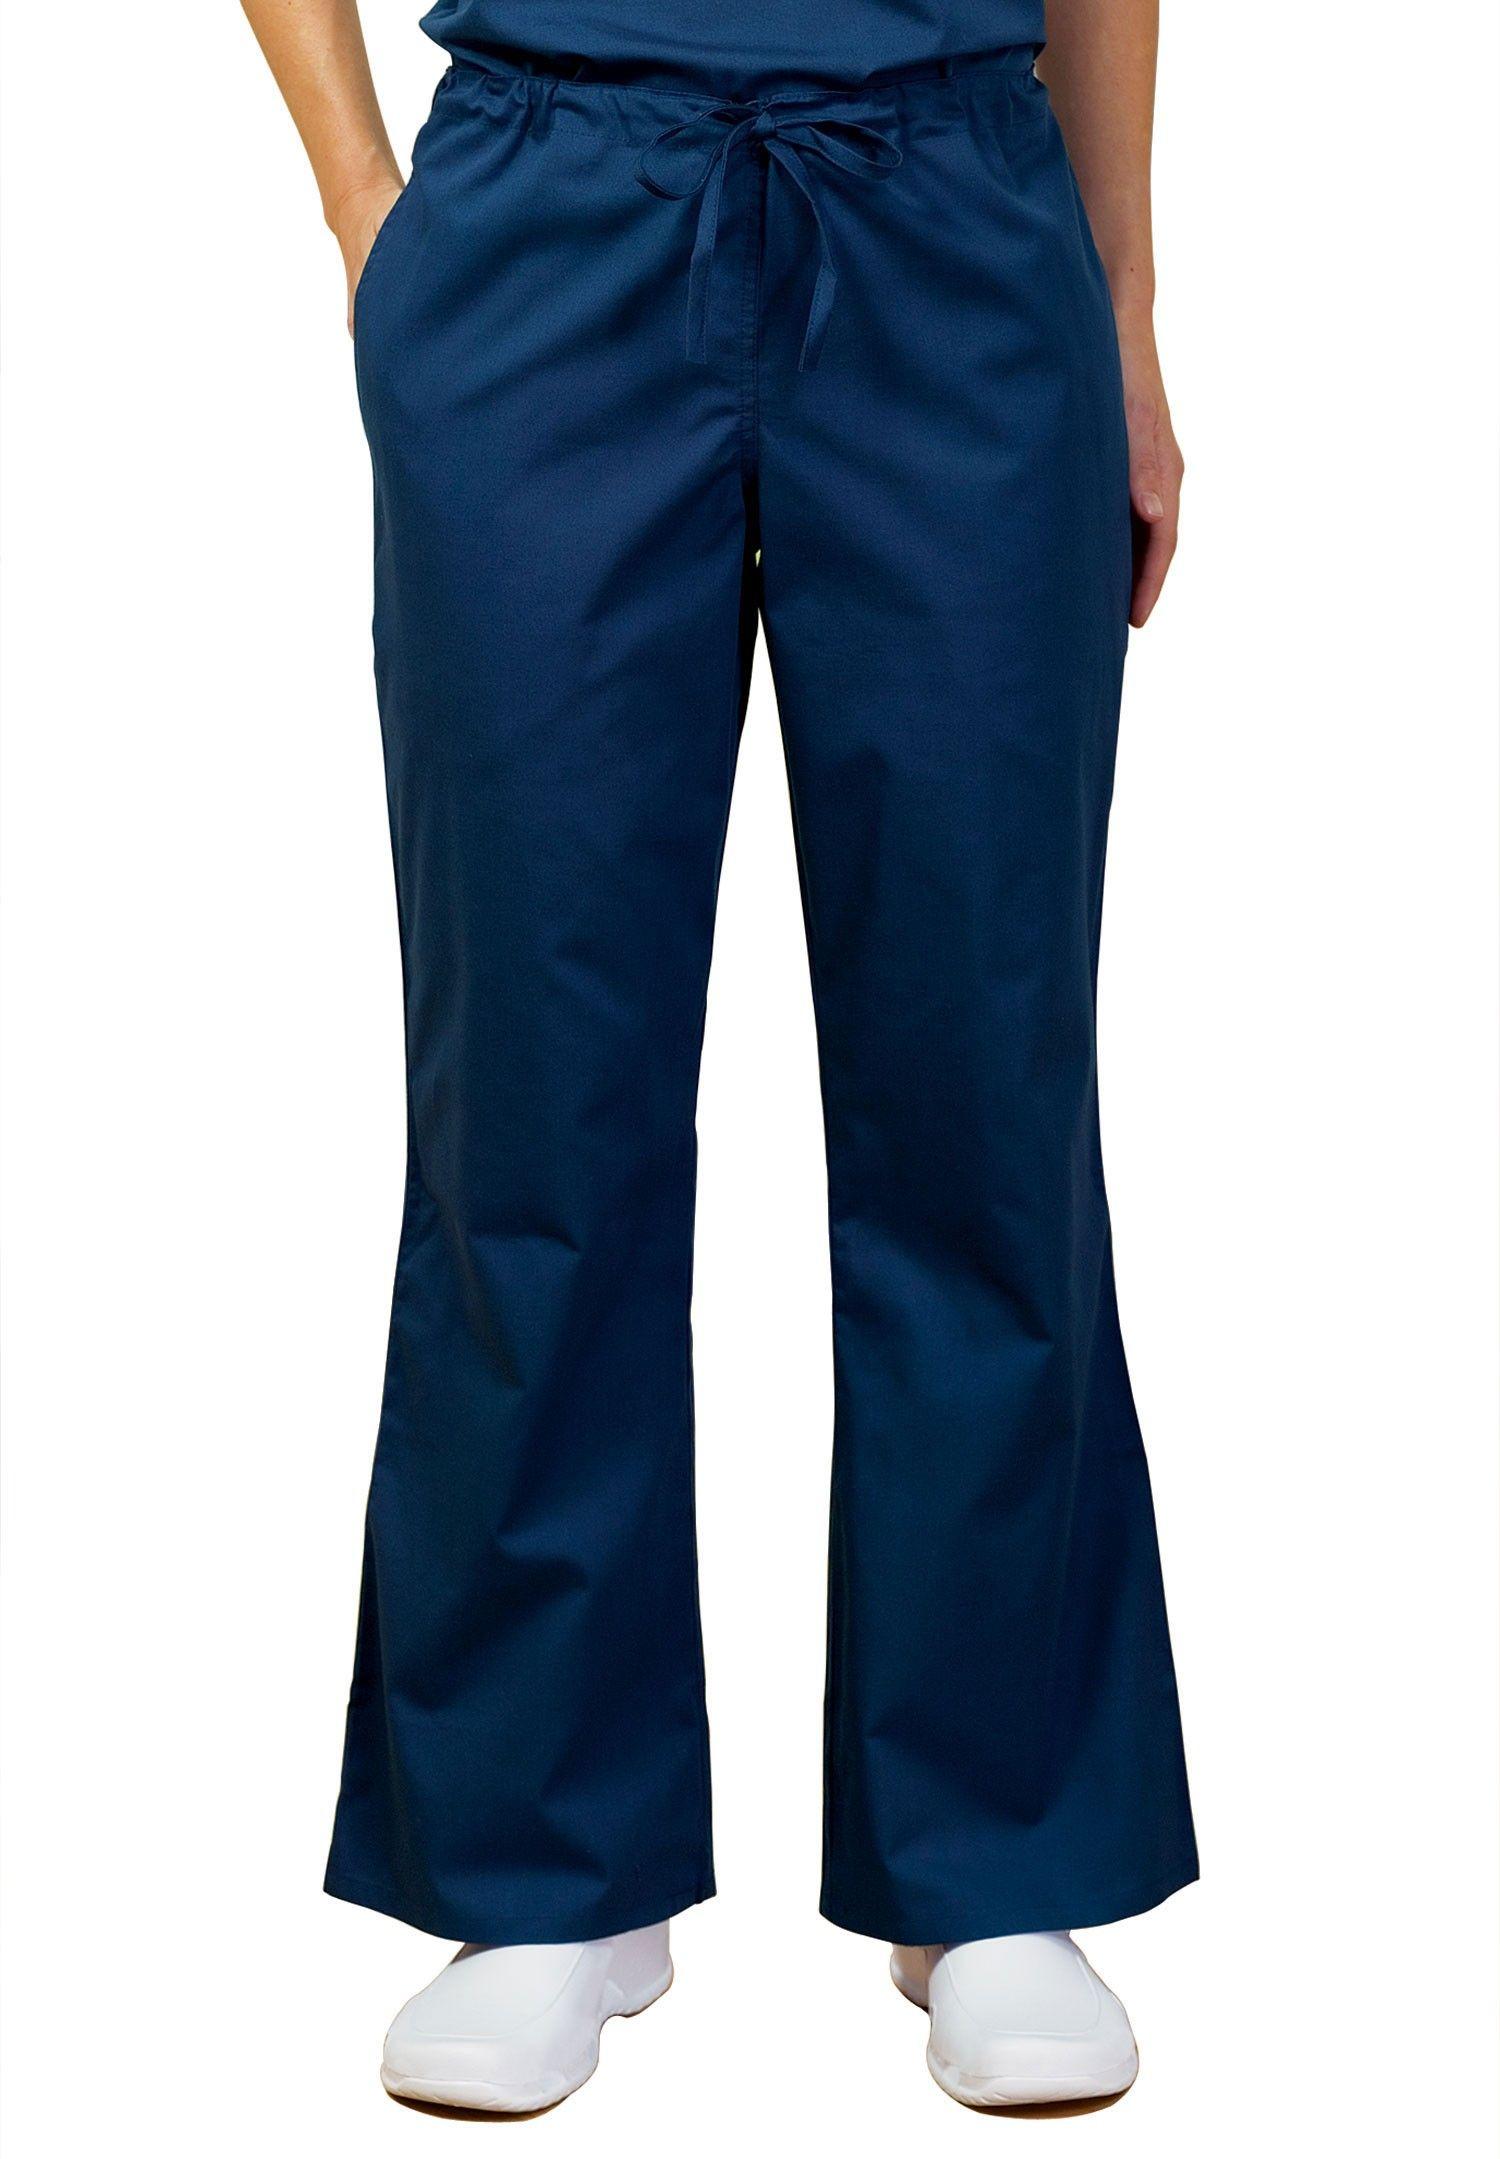 21f4cf3a637 Tafford Essentials Flare Leg Drawstring Scrub Pants | Scrub uniform ...